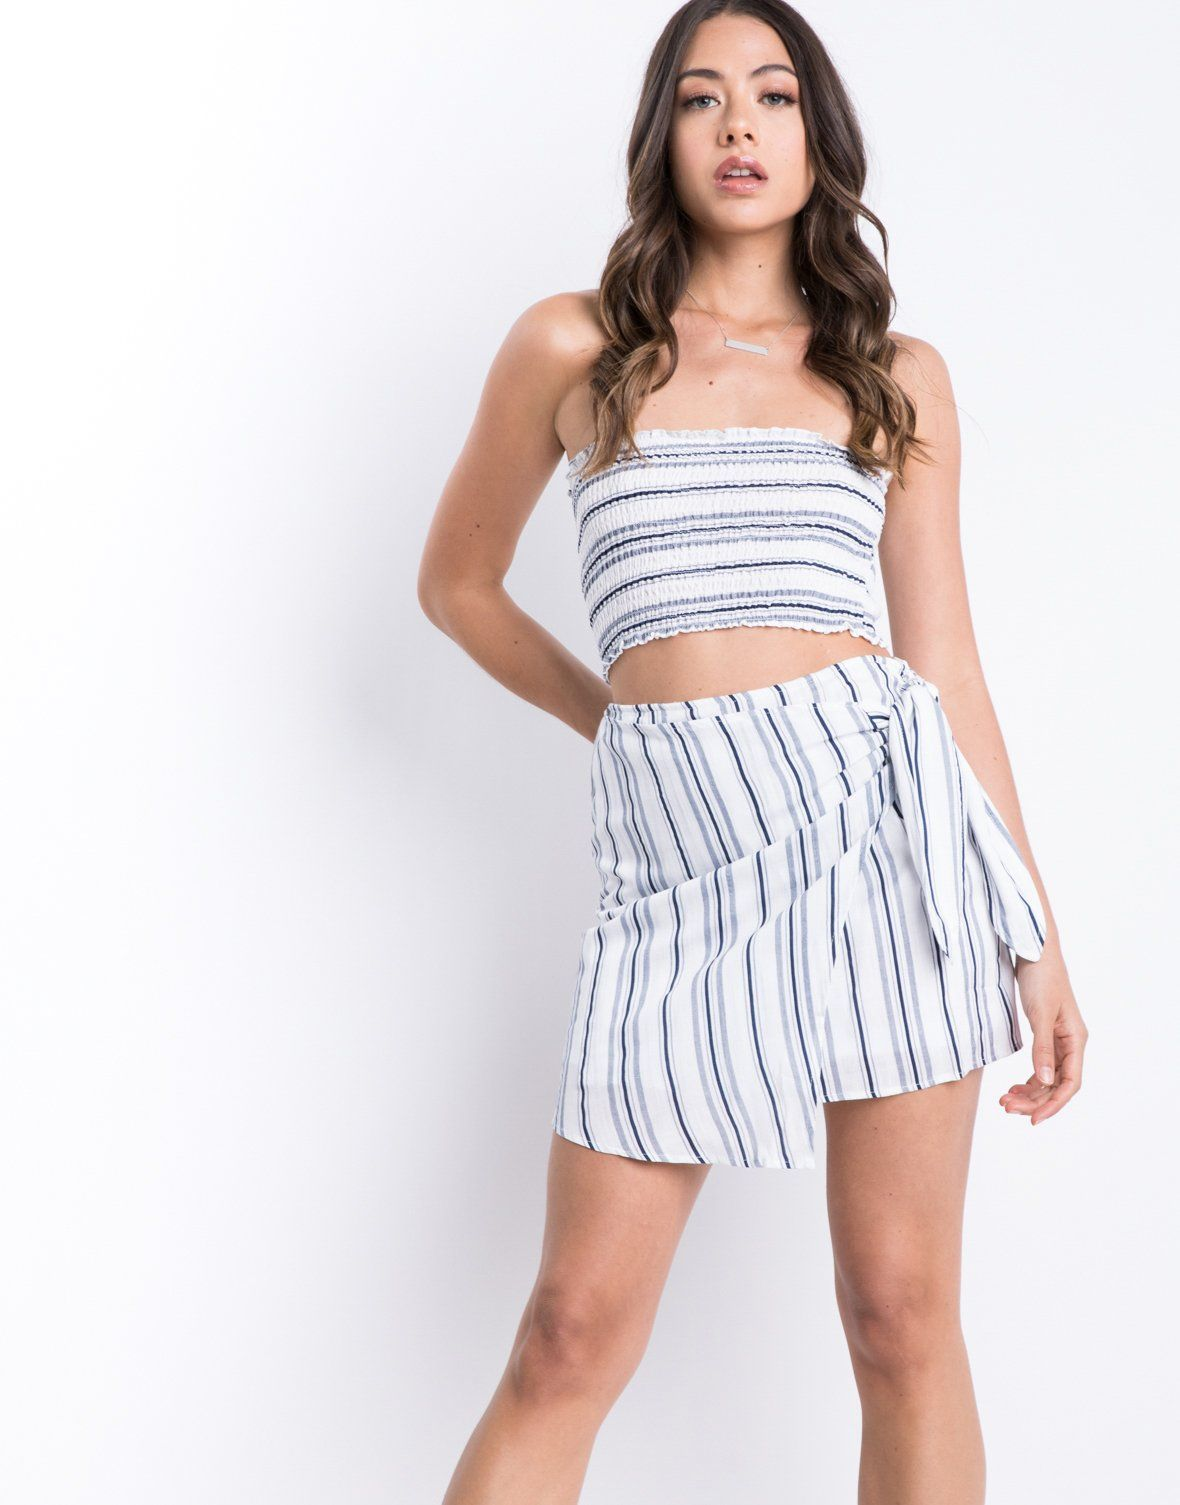 Seaside Wrap Skirt 2 Piece Set In 2021 Matching Sets Outfit Wrap Skirt Two Piece Outfits Skirt